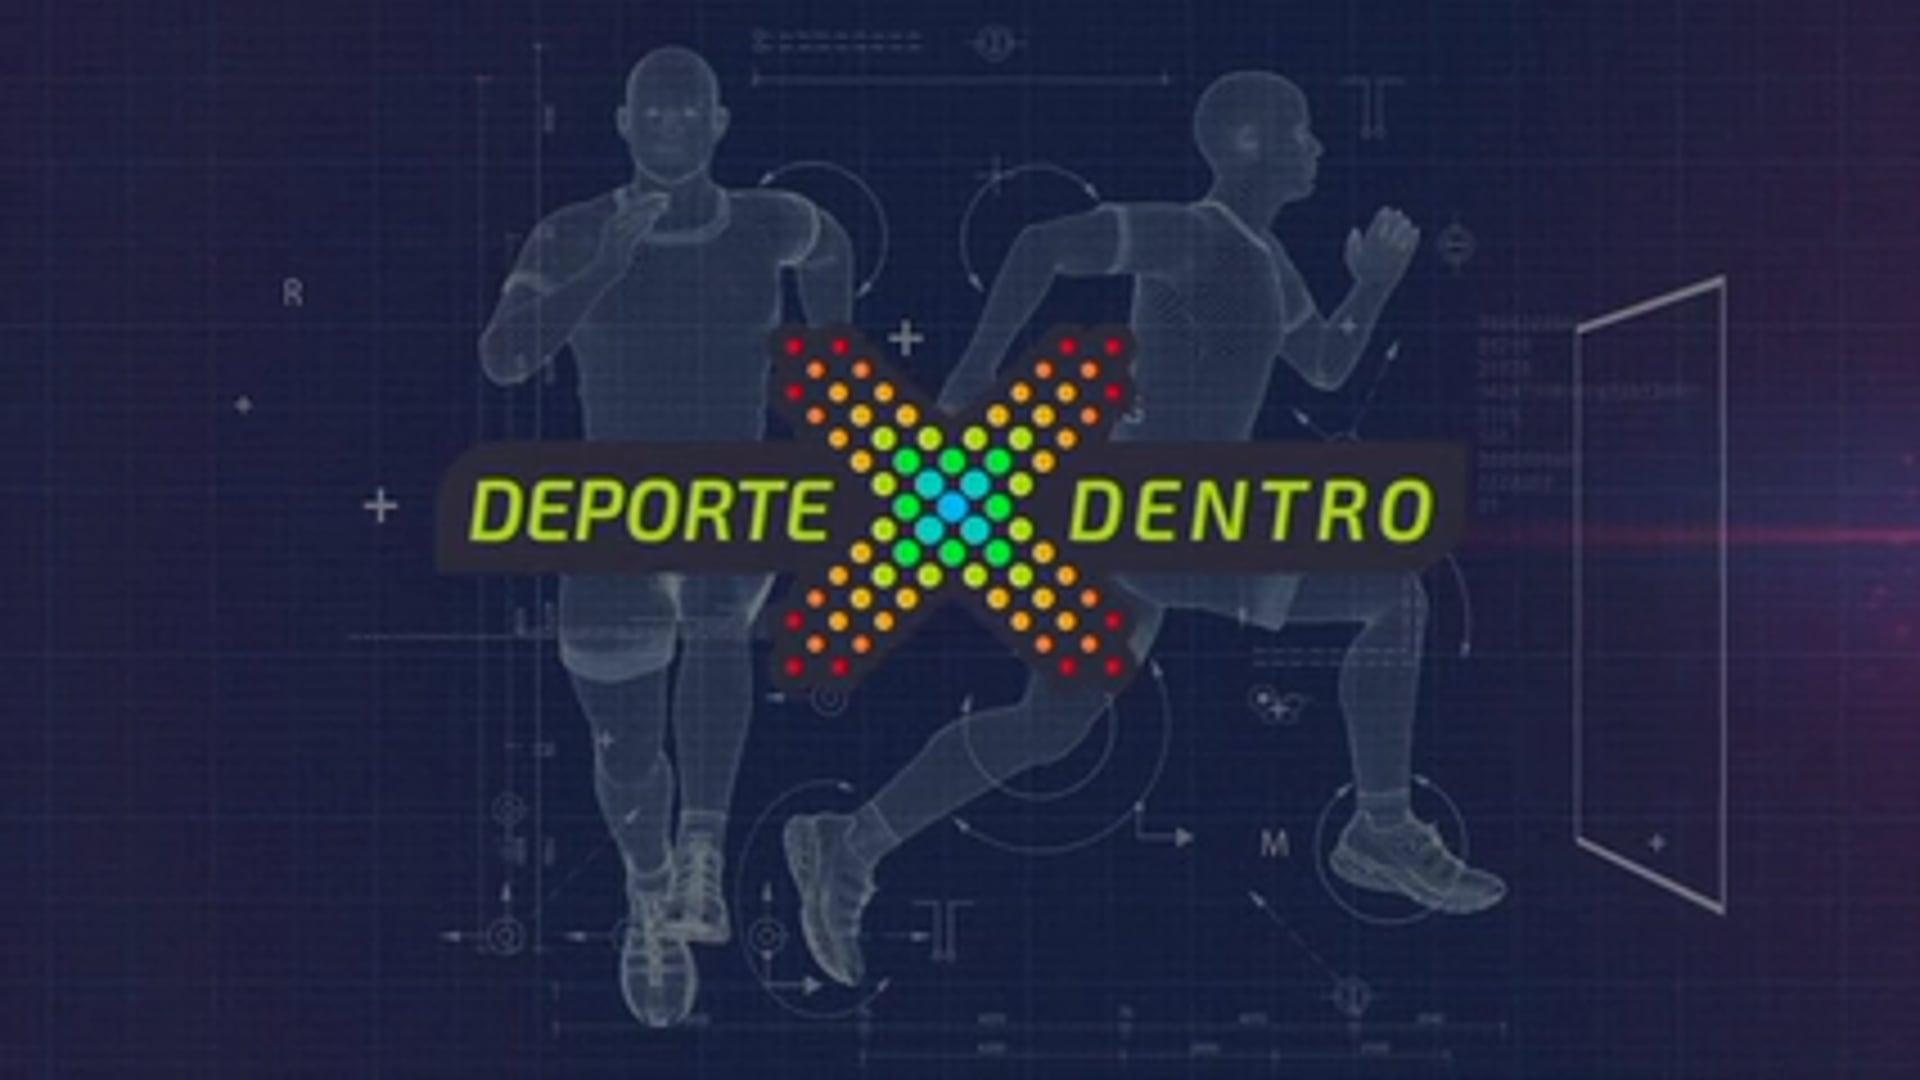 Deporte X Dentro